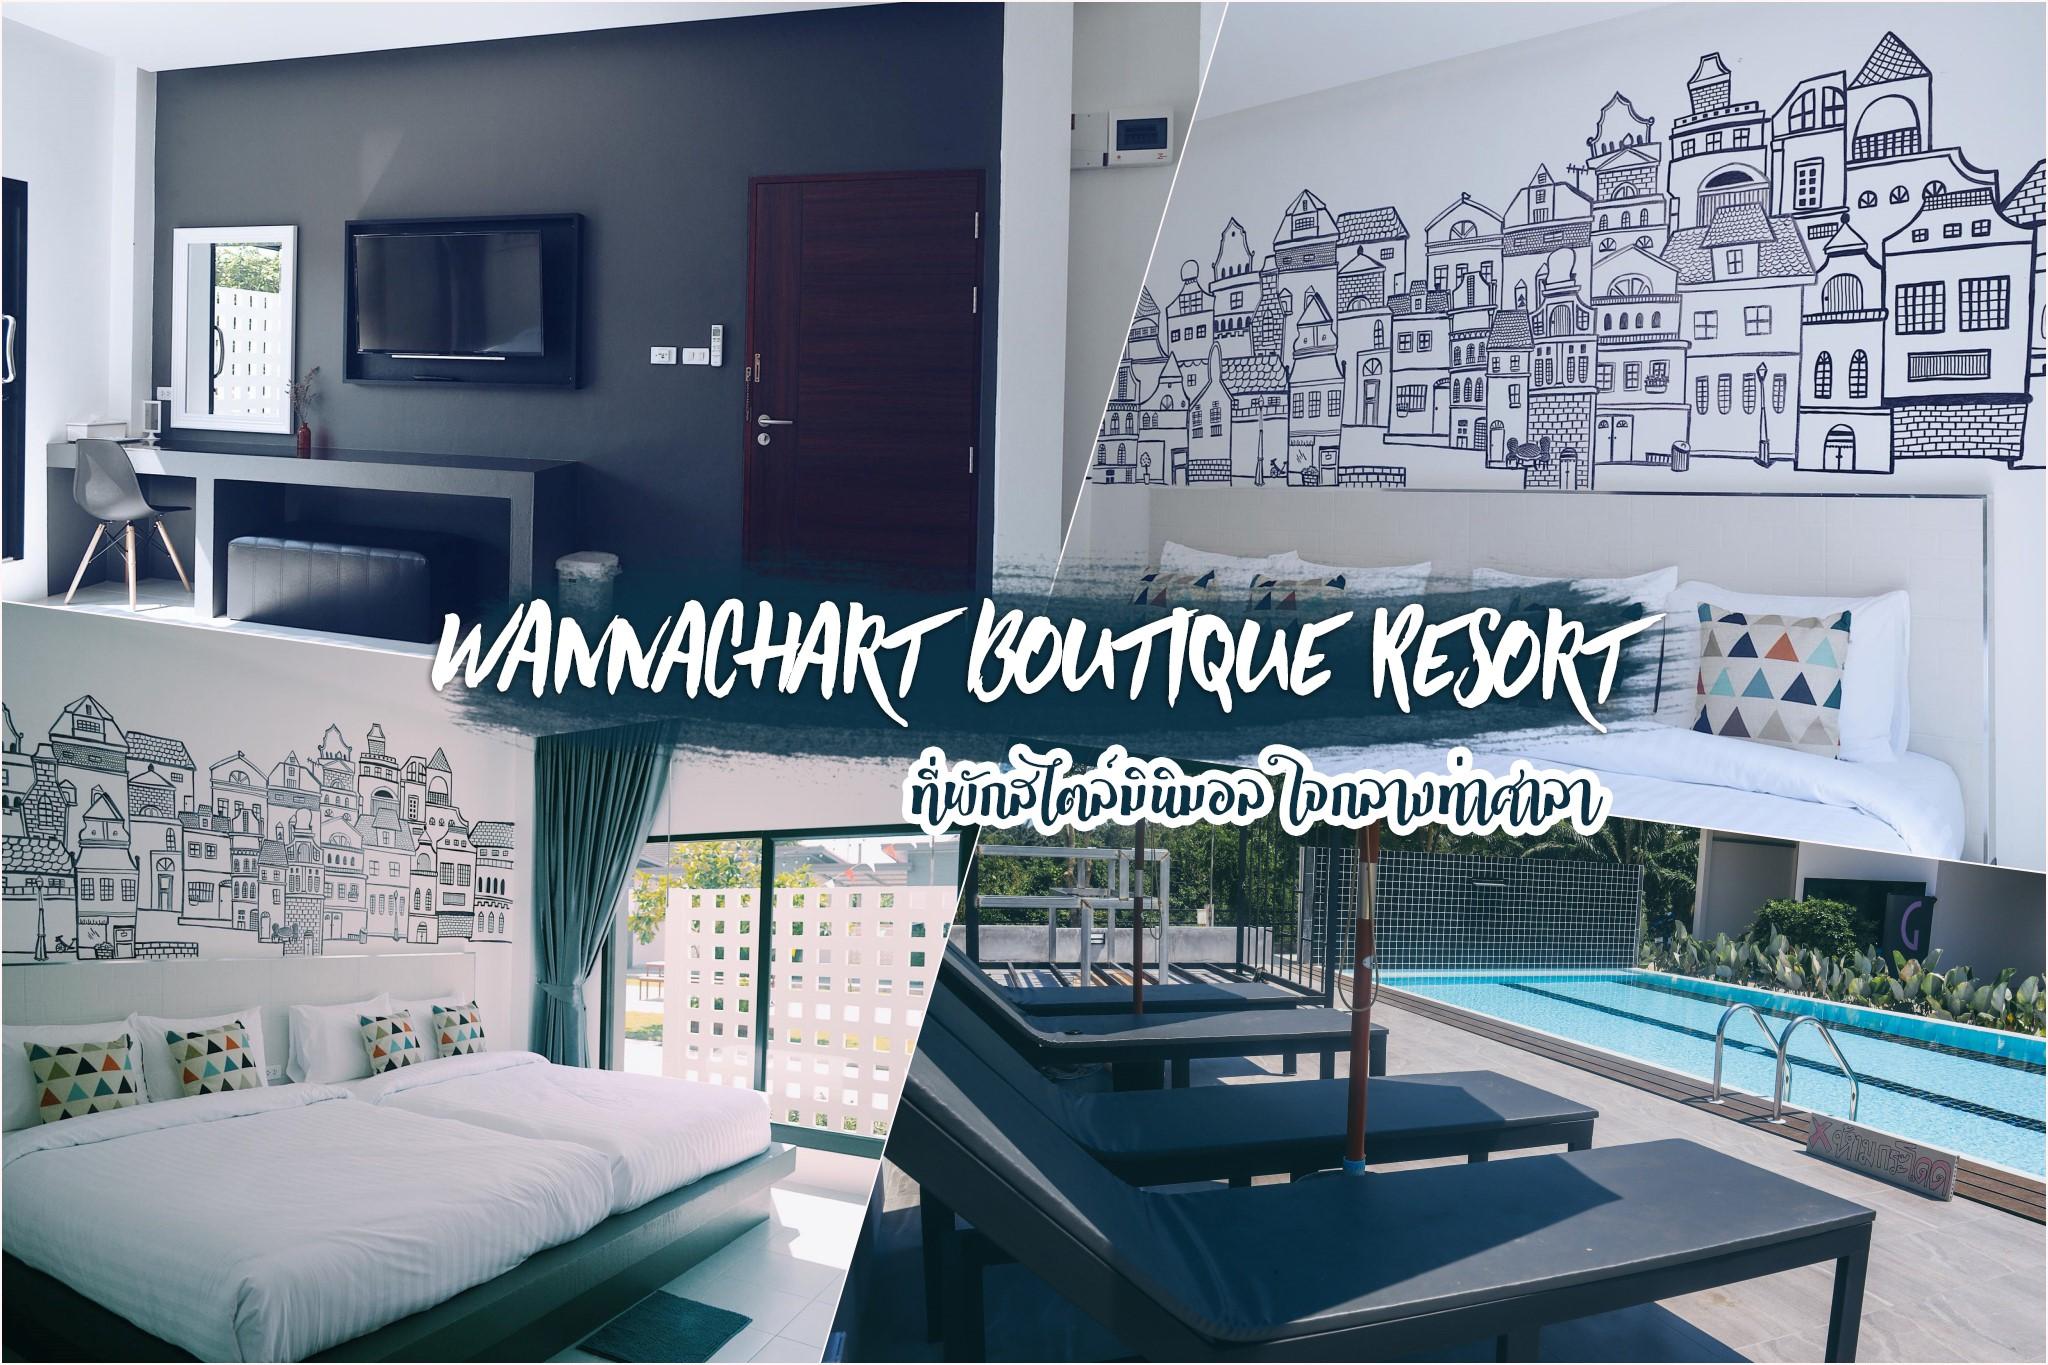 22.-Wannachart-Boutique-Resort-https://nakhonsidee.com/show/read/4/157  checkin,nakhonsithammarat,ของกิน,ร้านอาหาร,จุดเช็คอิน,ที่เที่ยว